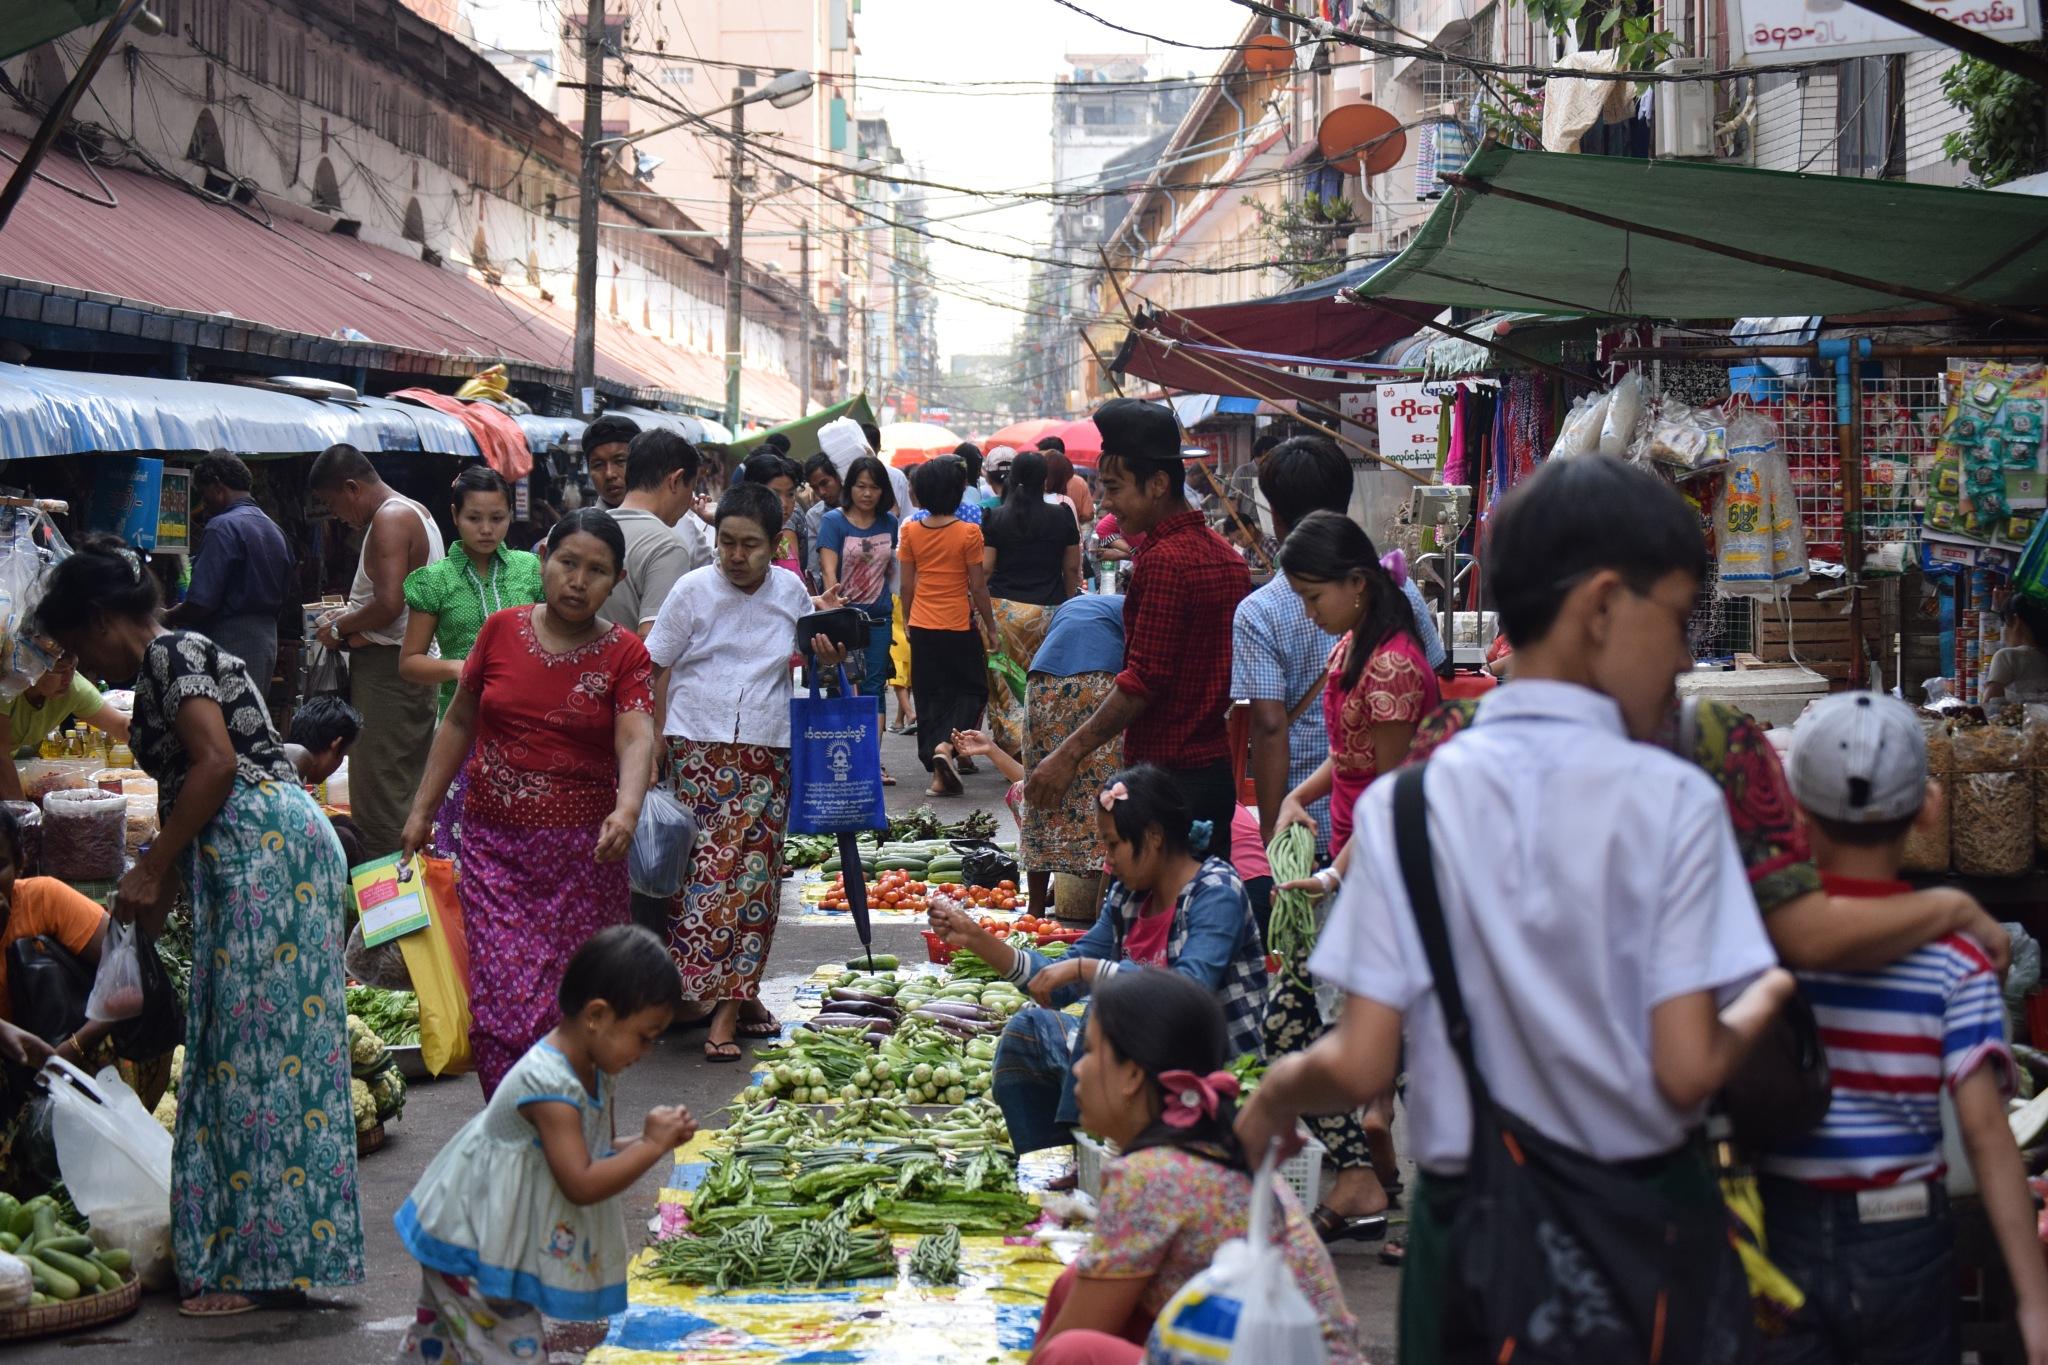 Claustrophobia in the Market by Jason Murphy